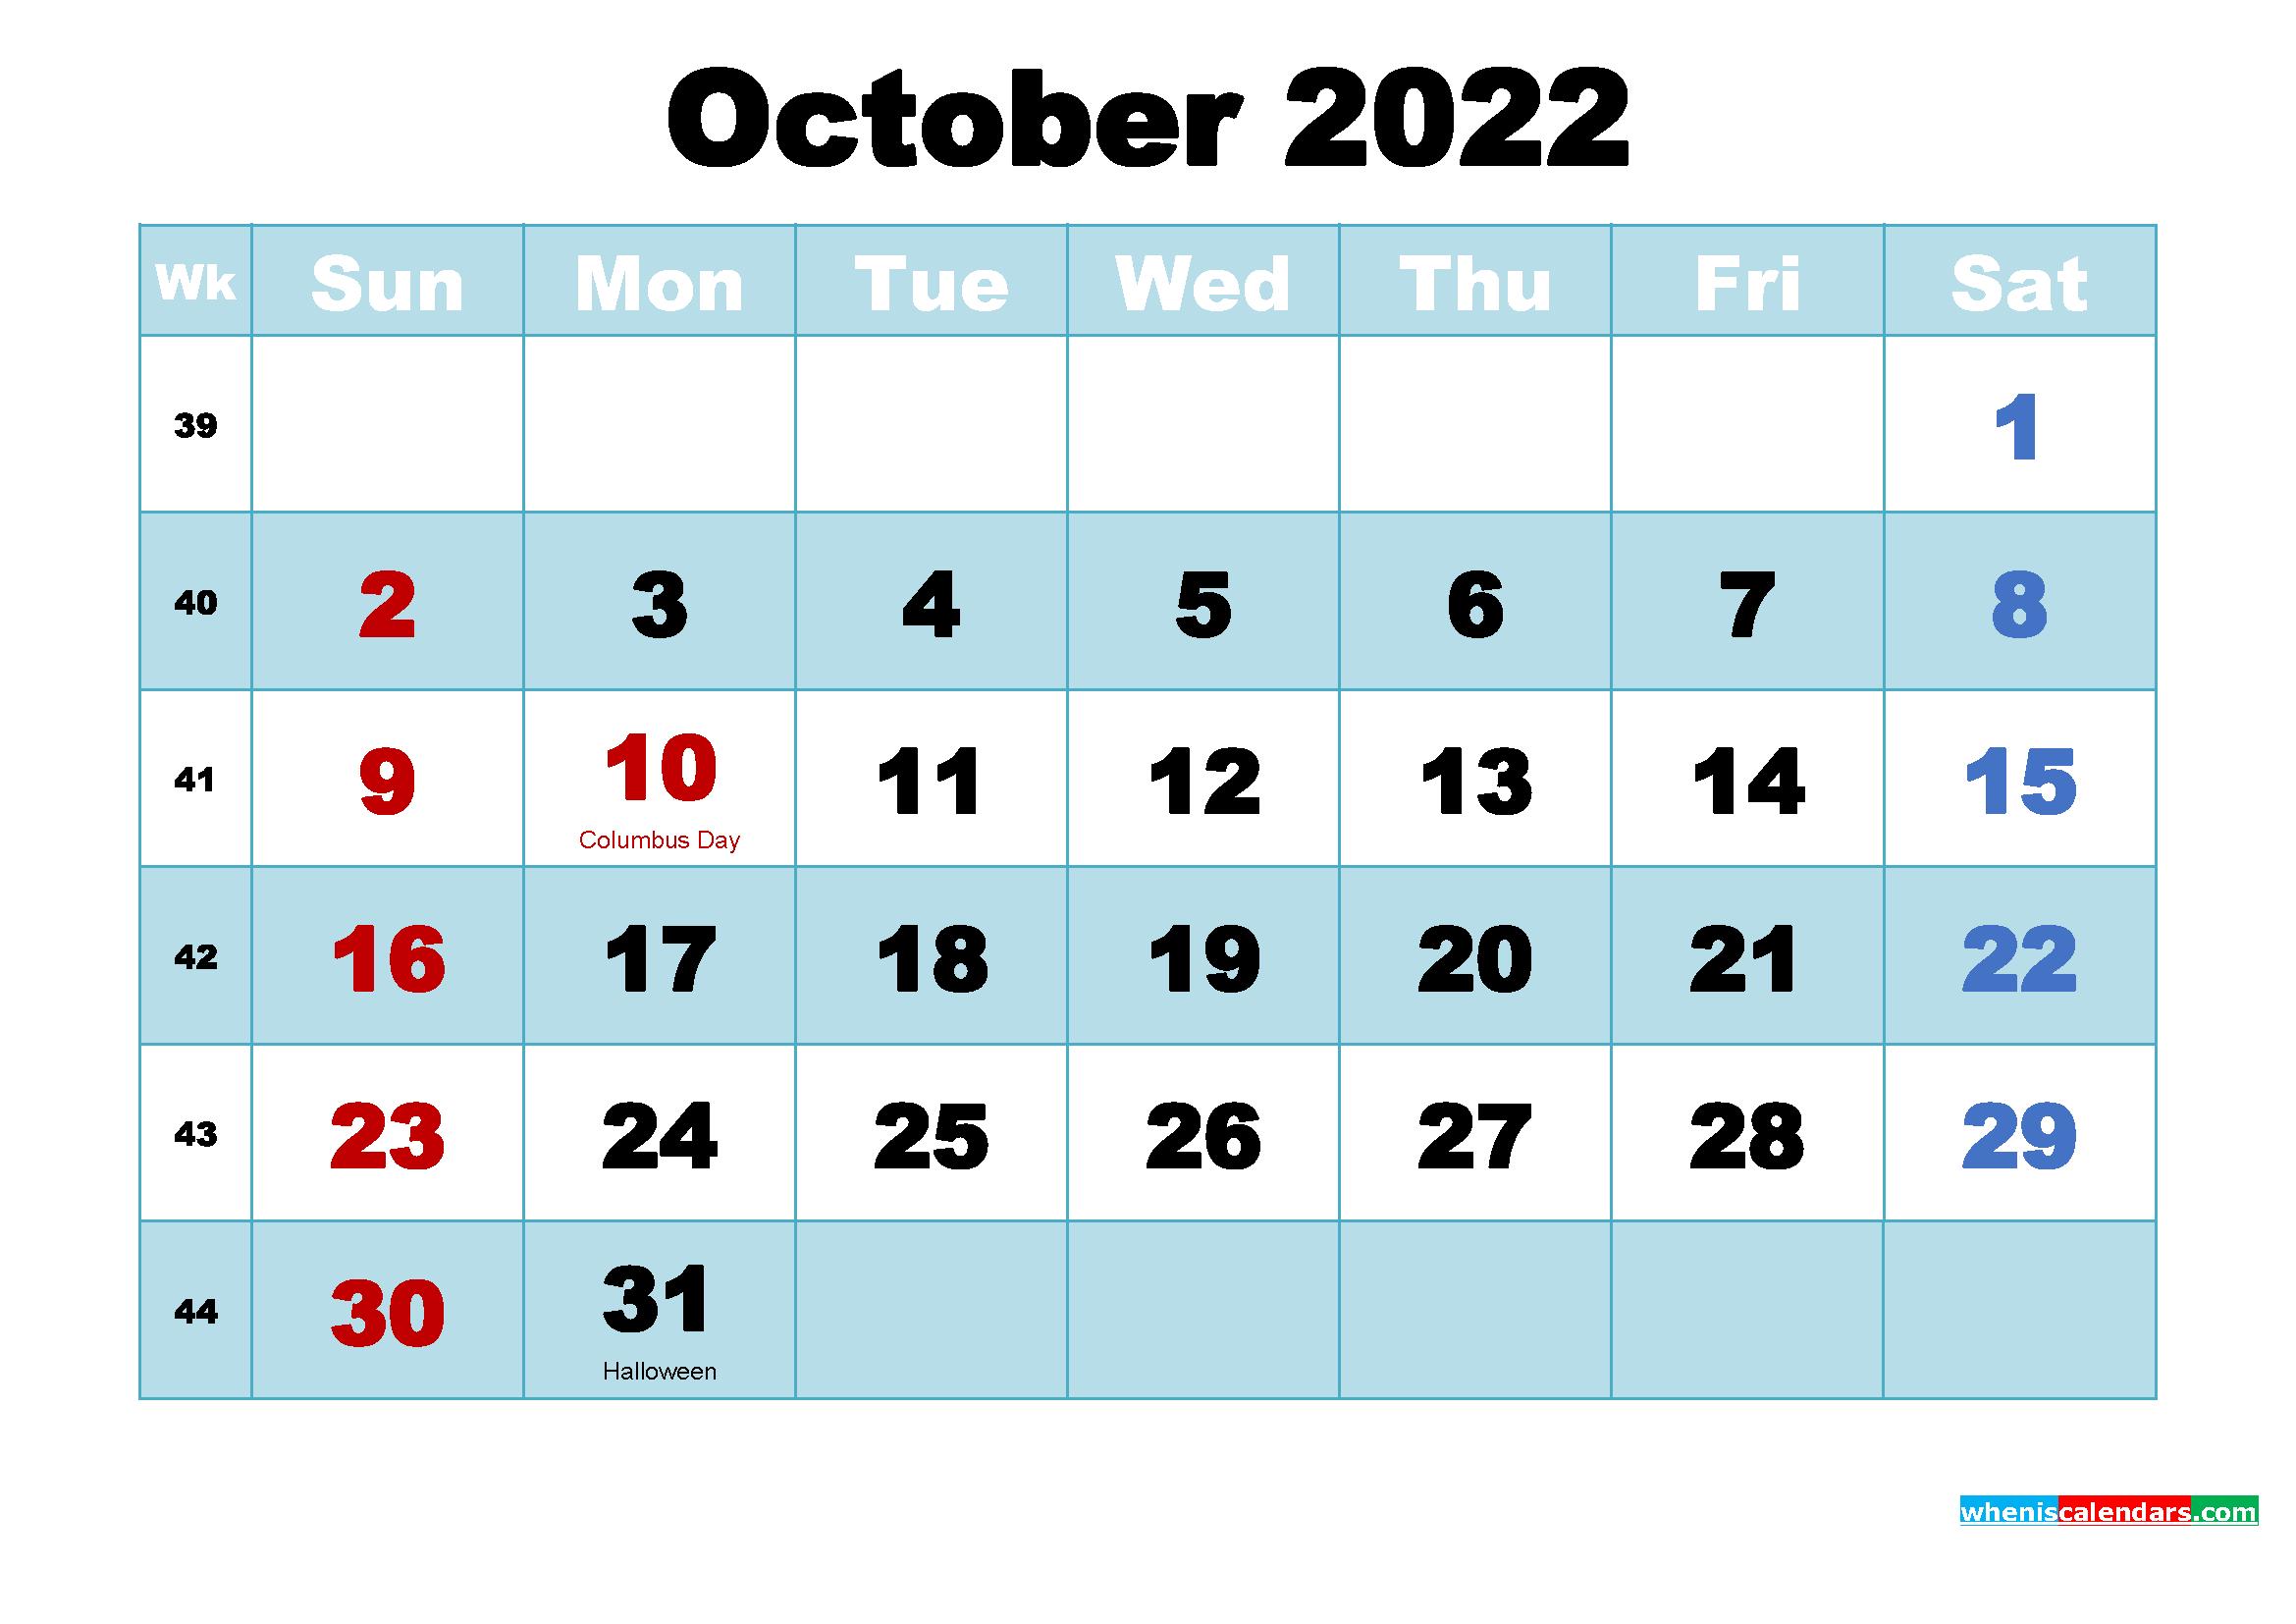 October 2022 Desktop Calendar with Holidays